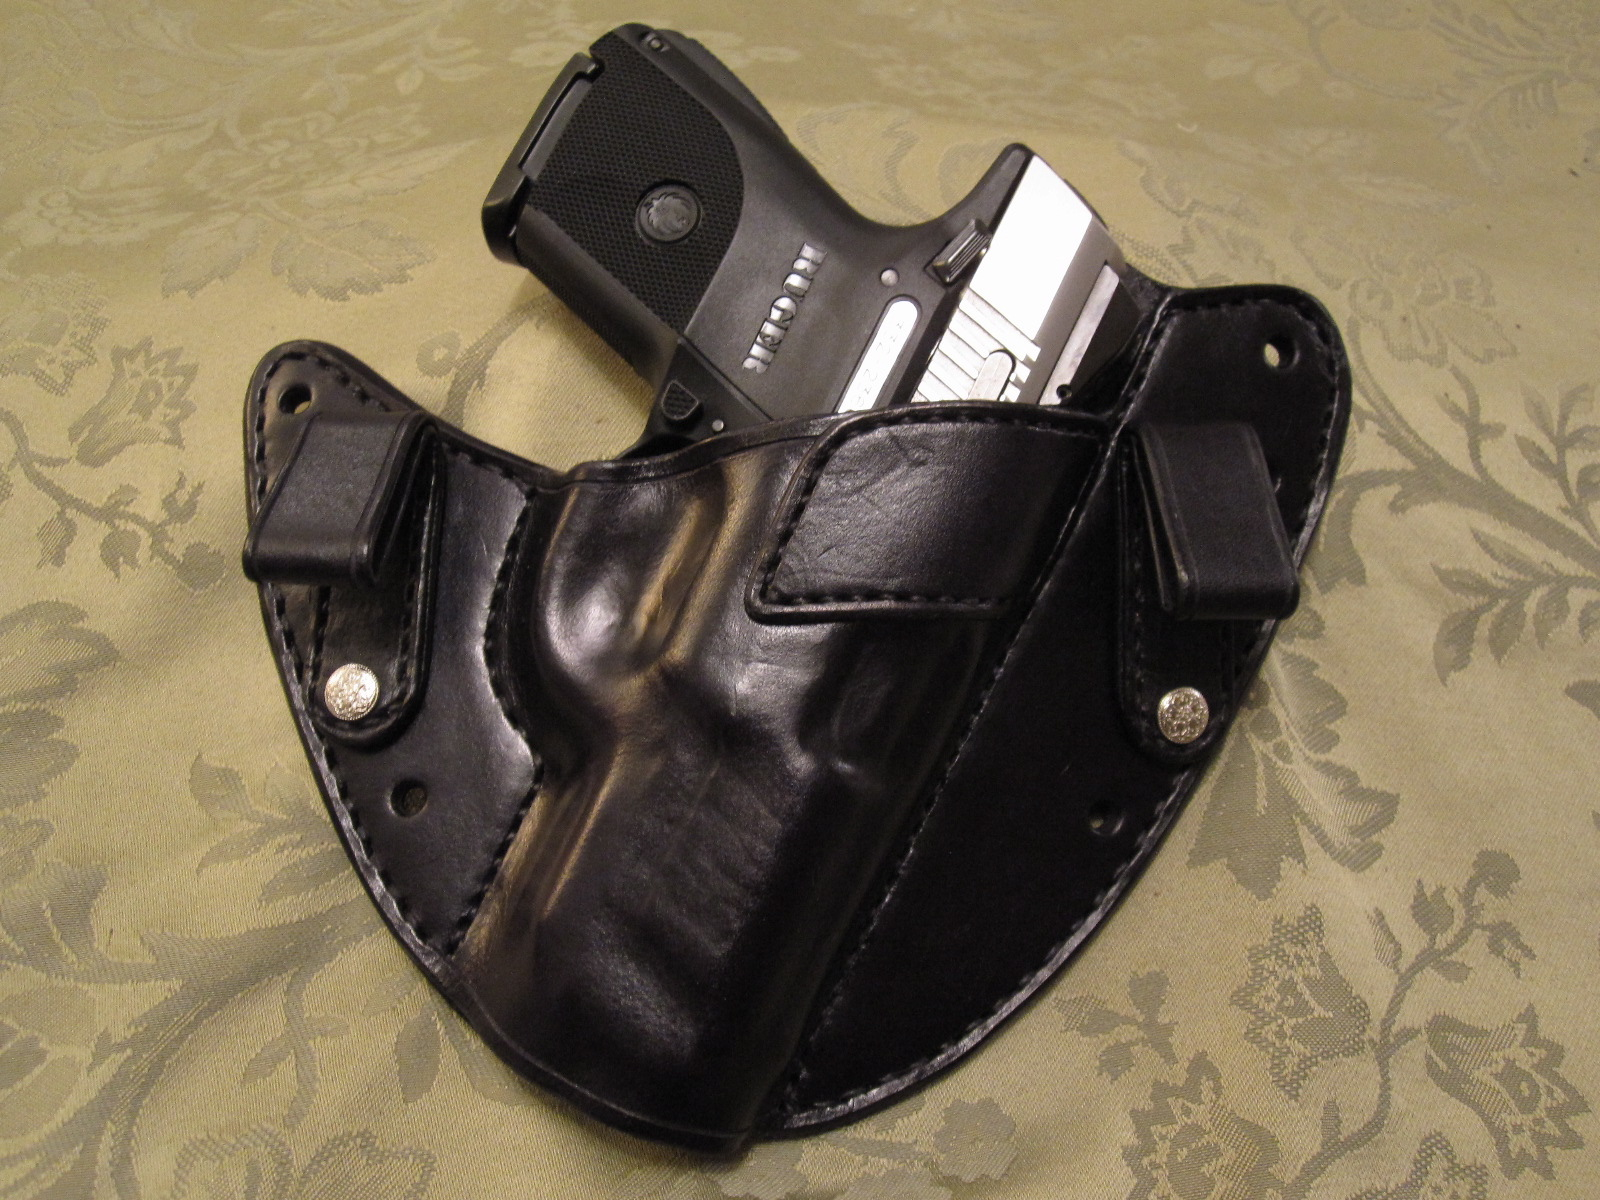 New Tuckable Iwb Holster For Ruger Sr9C - Gun Holsters, Rifle Slings